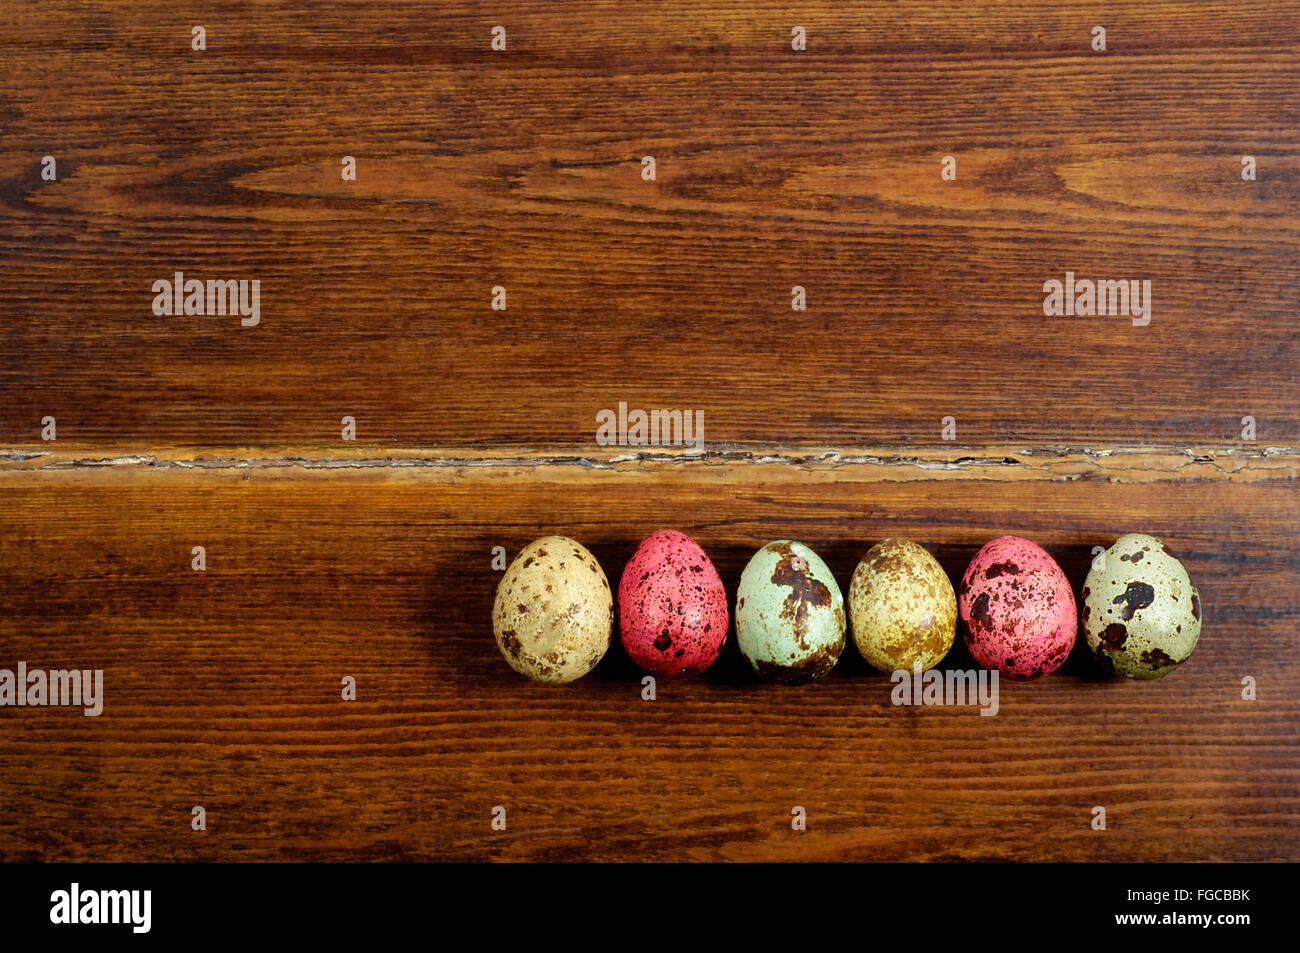 Varios coloridos huevos de codorniz sobre fondo de madera Foto de stock